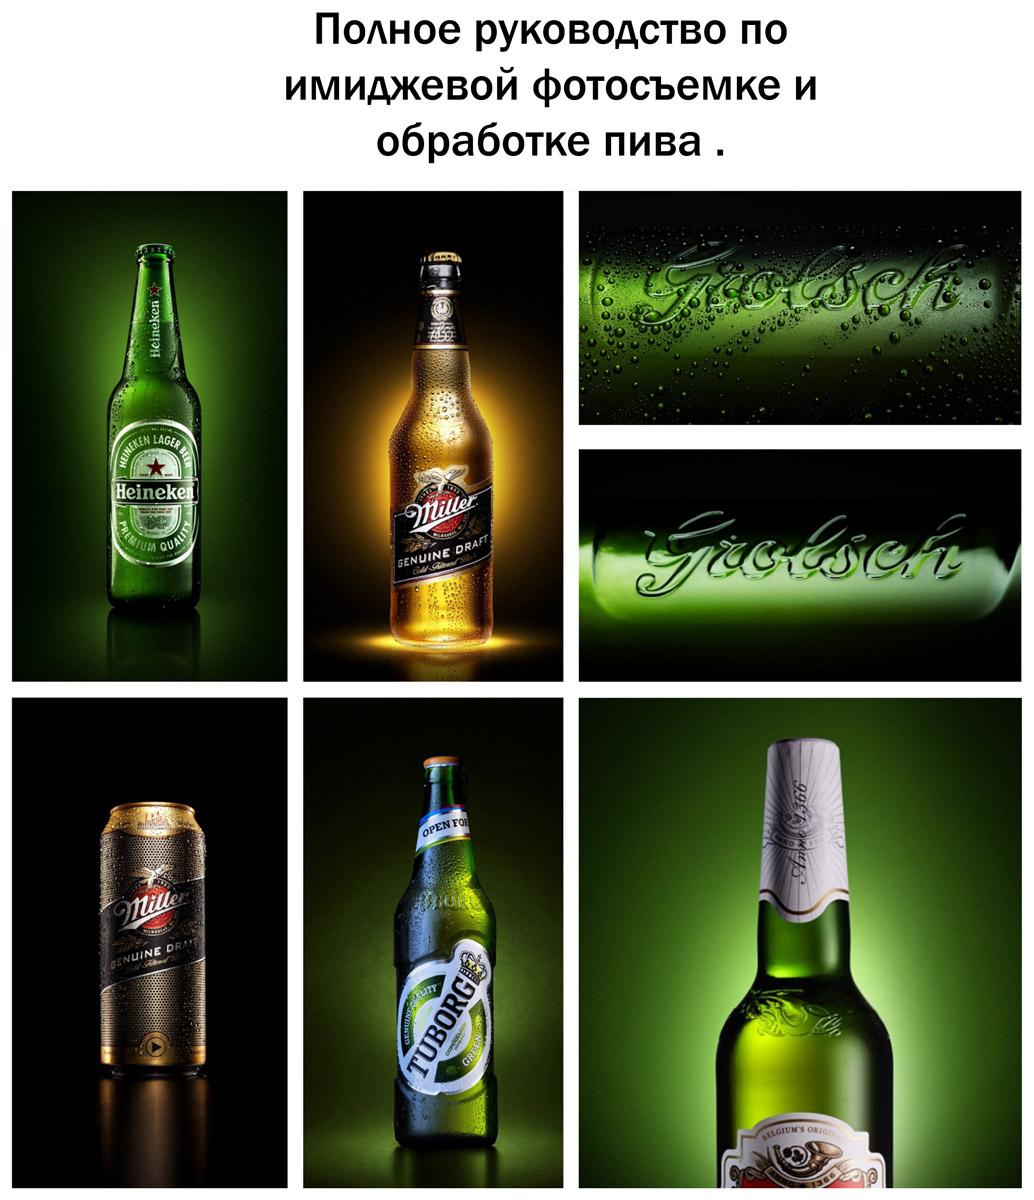 Съемка_пива.jpg